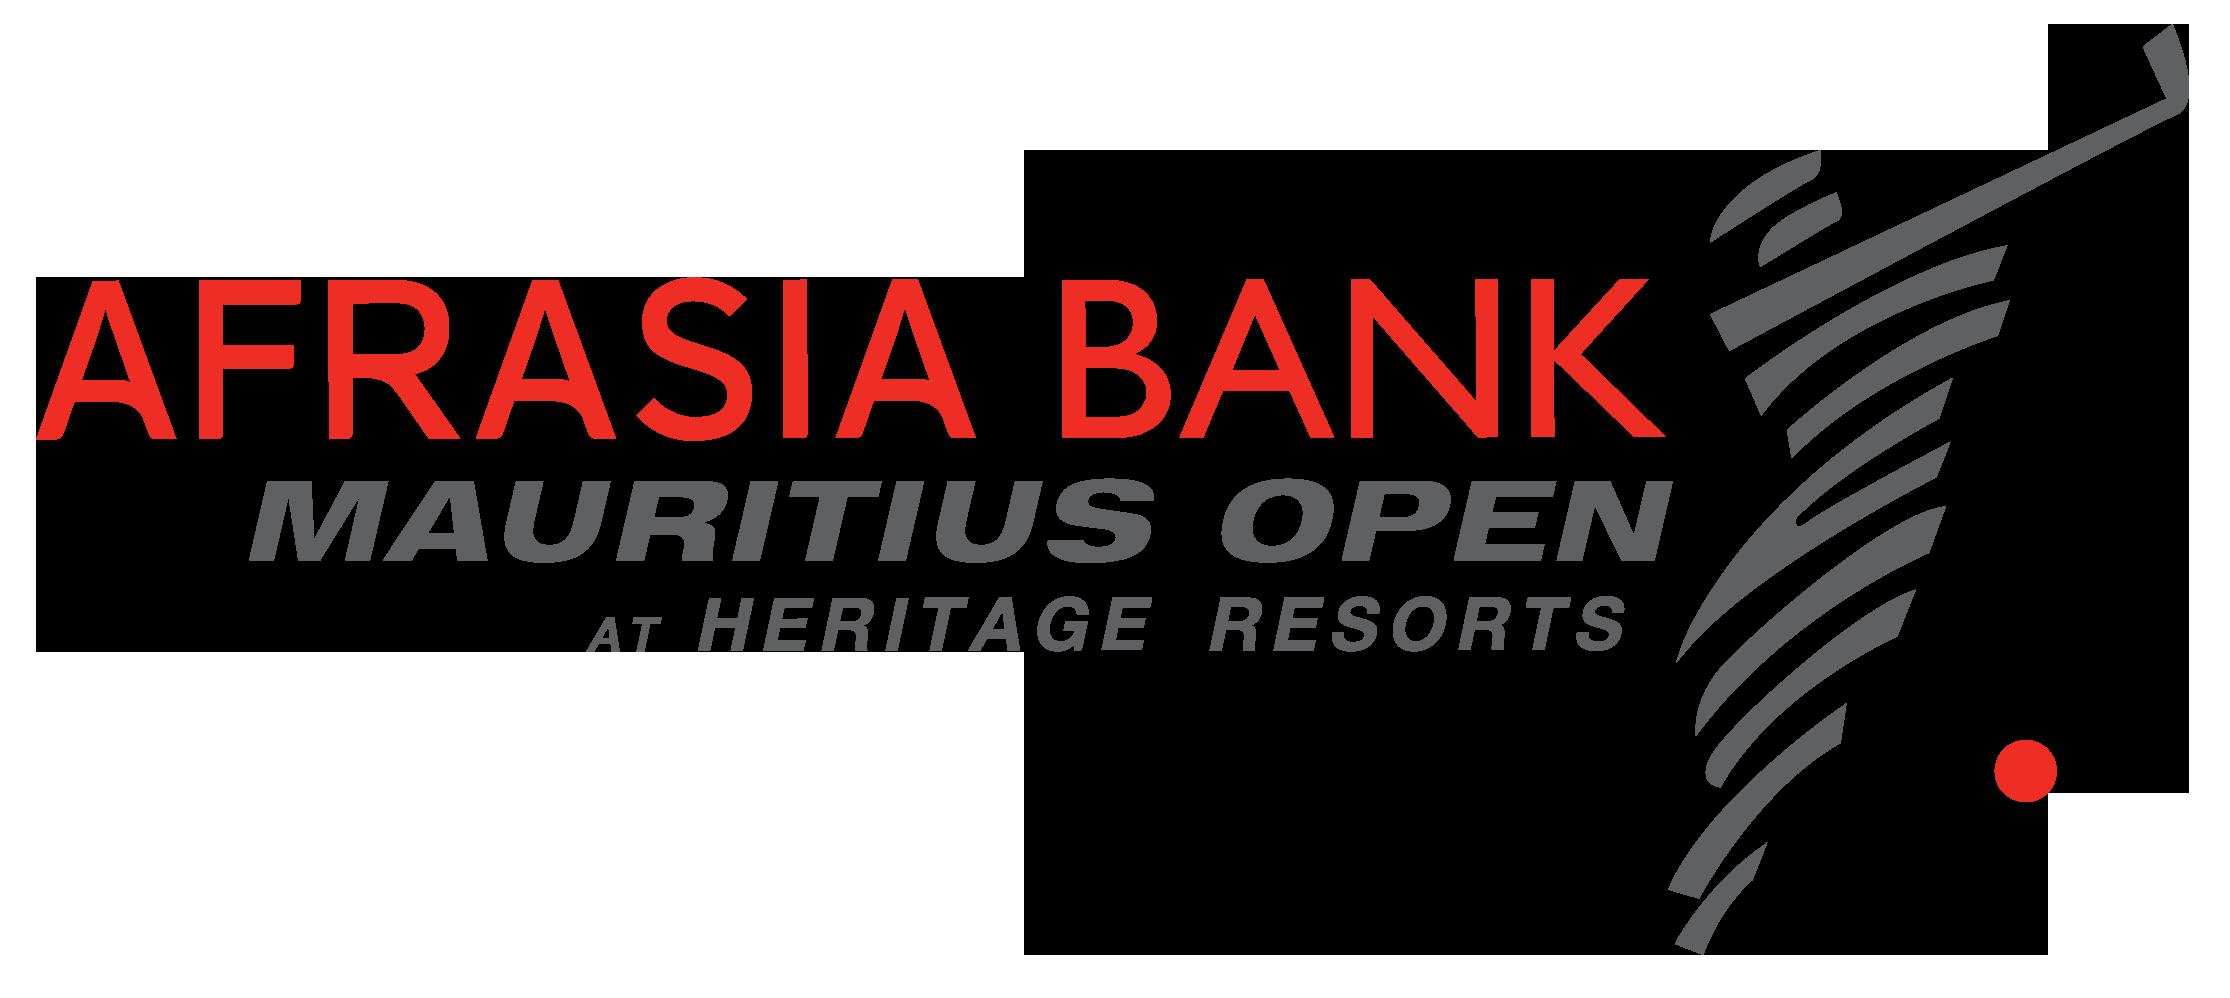 Afrasia B Mauritius Open.png